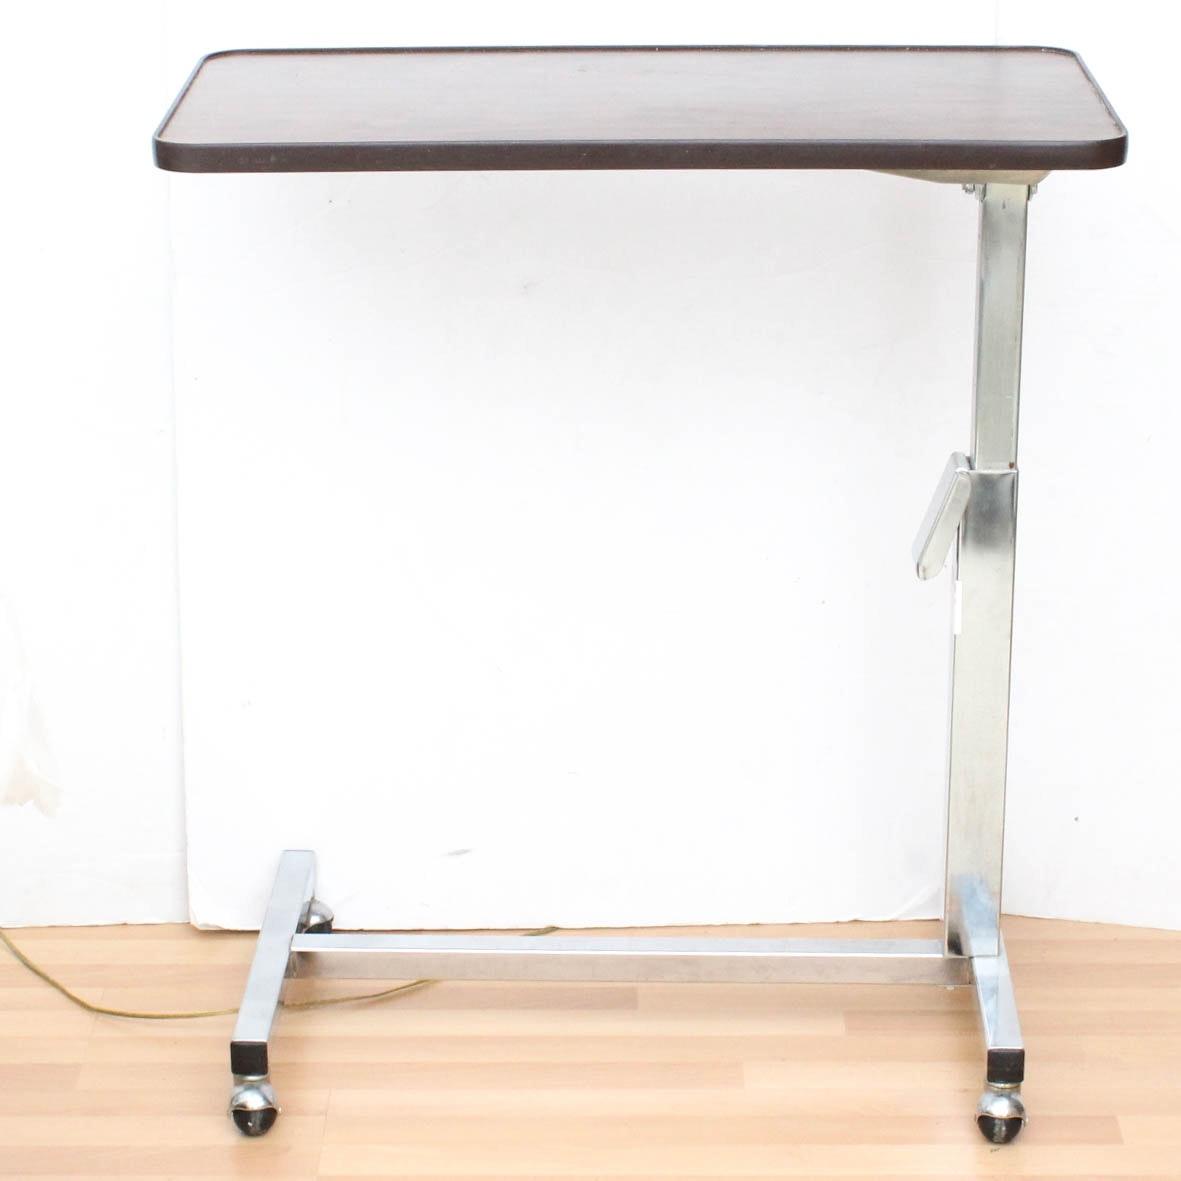 Adjustable Height Bedside Table